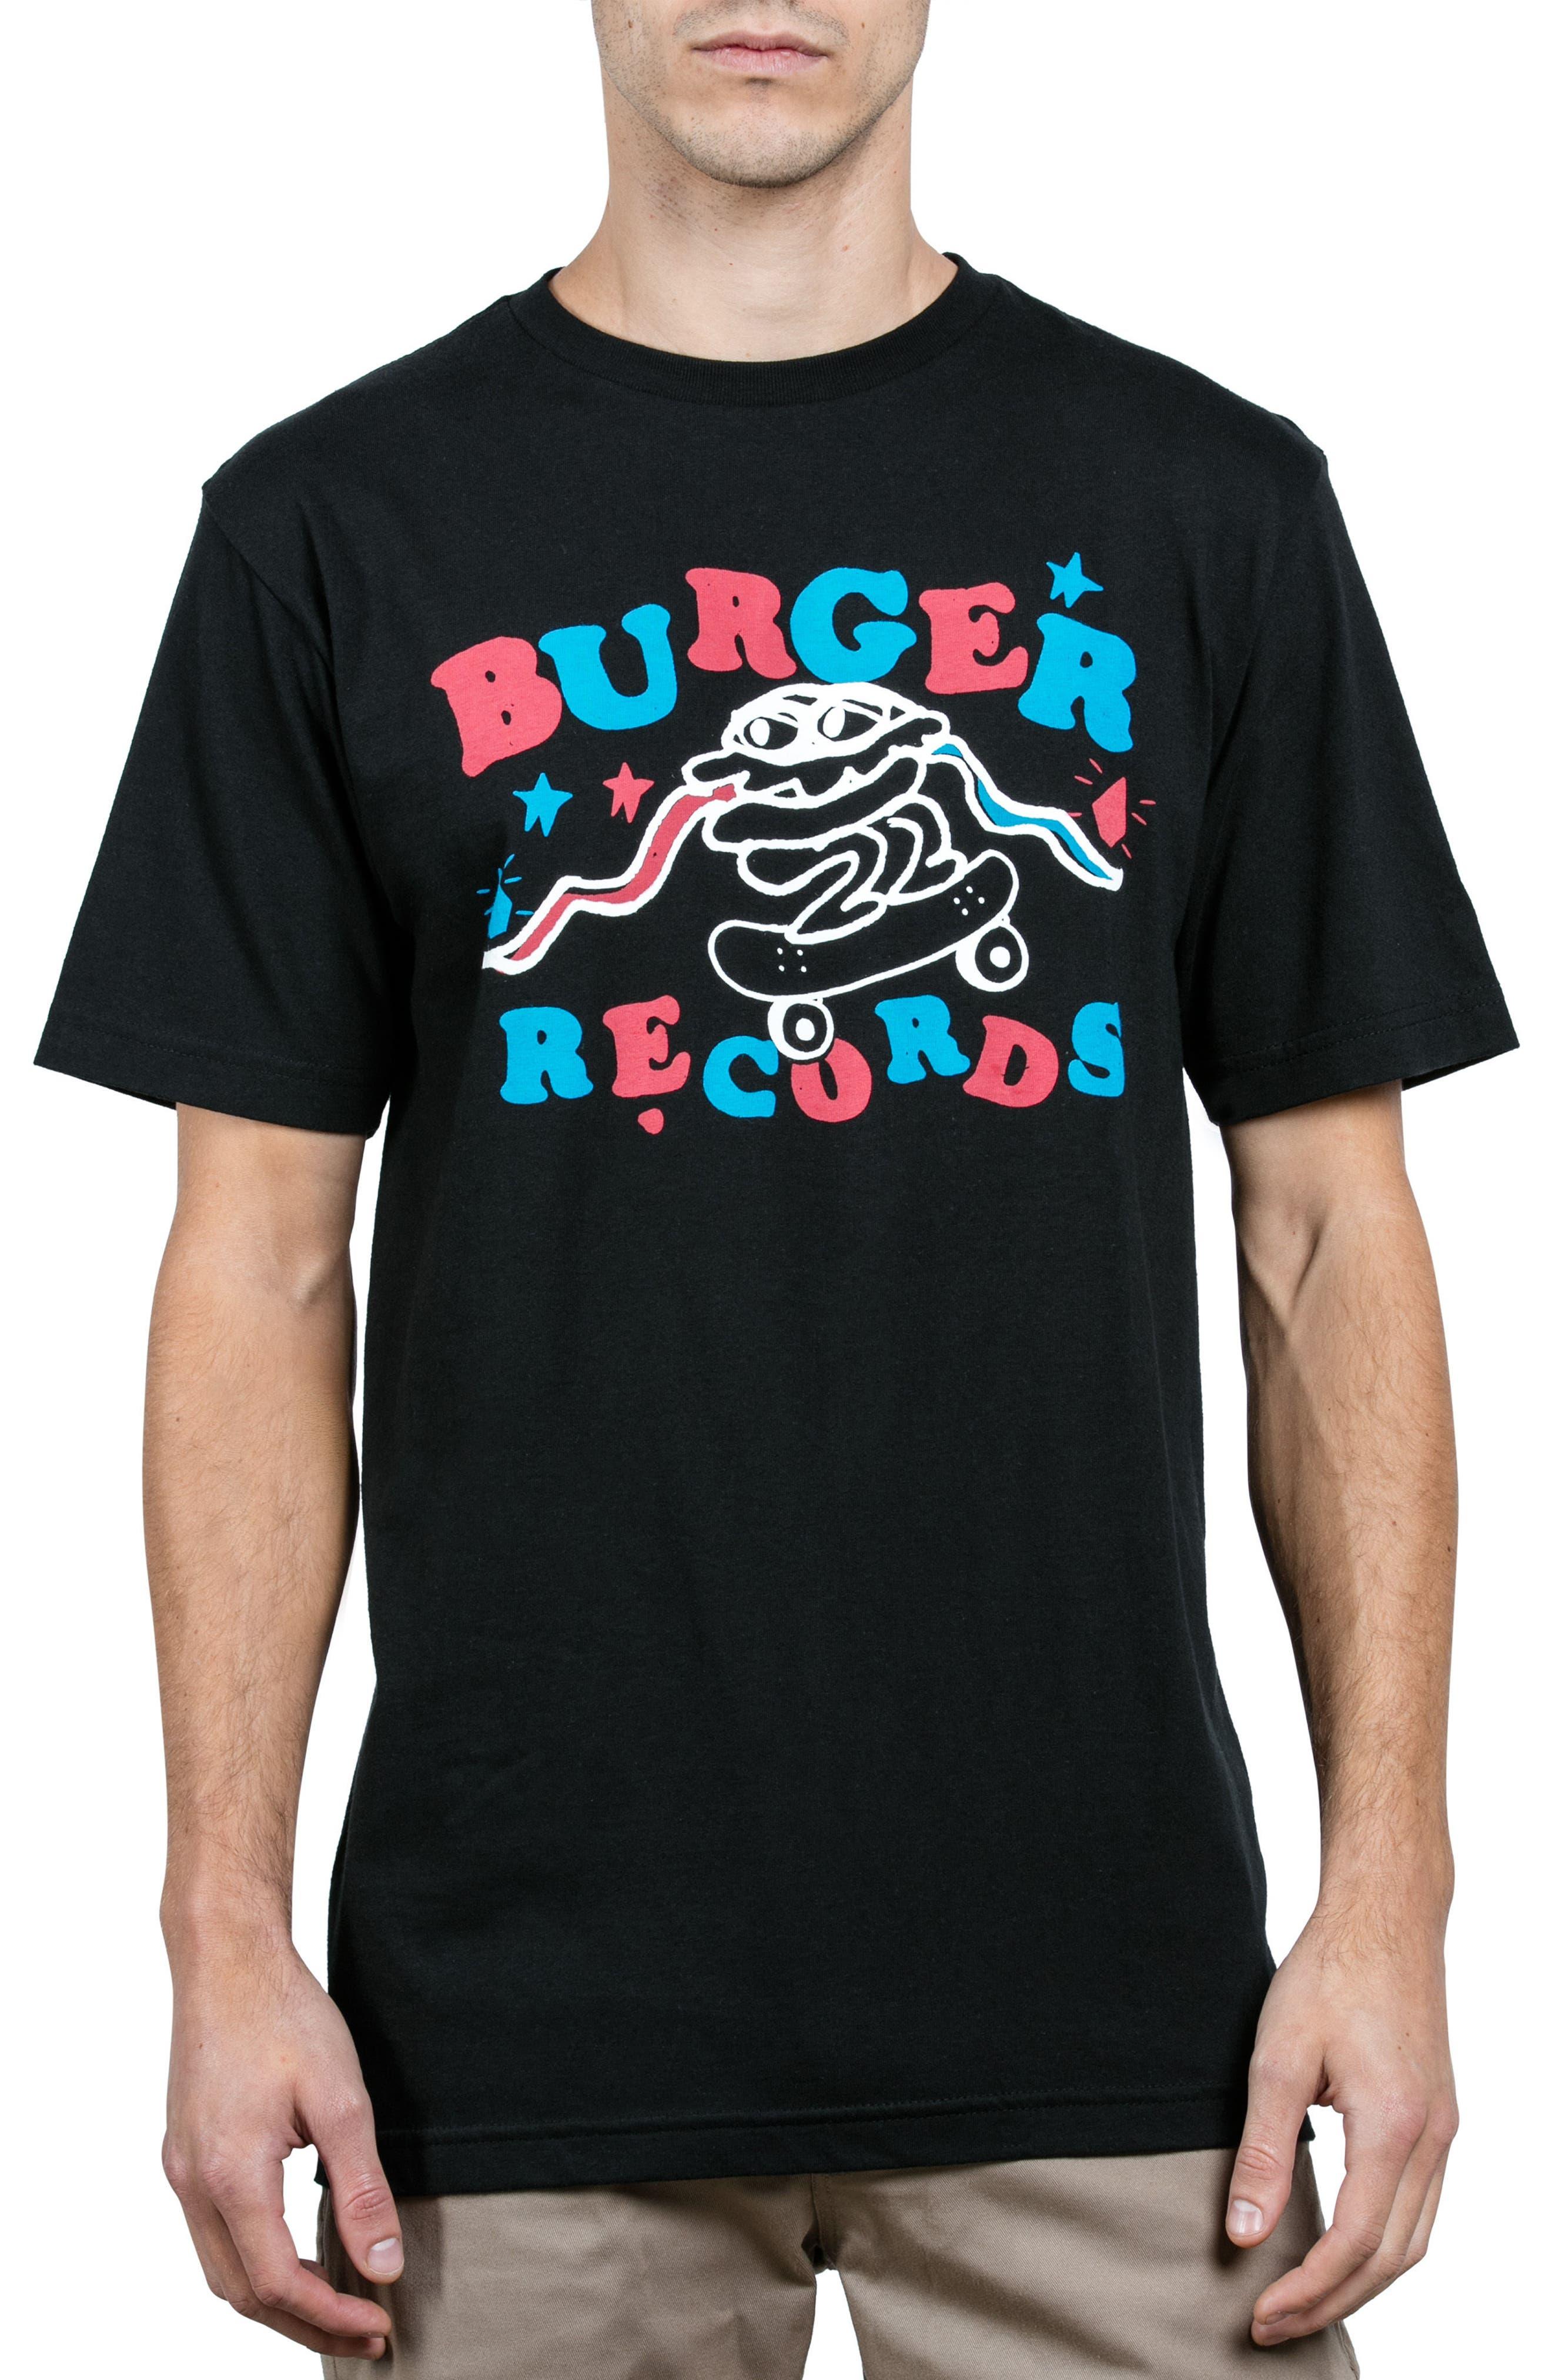 Main Image - Volcom x Burger Records T-Shirt